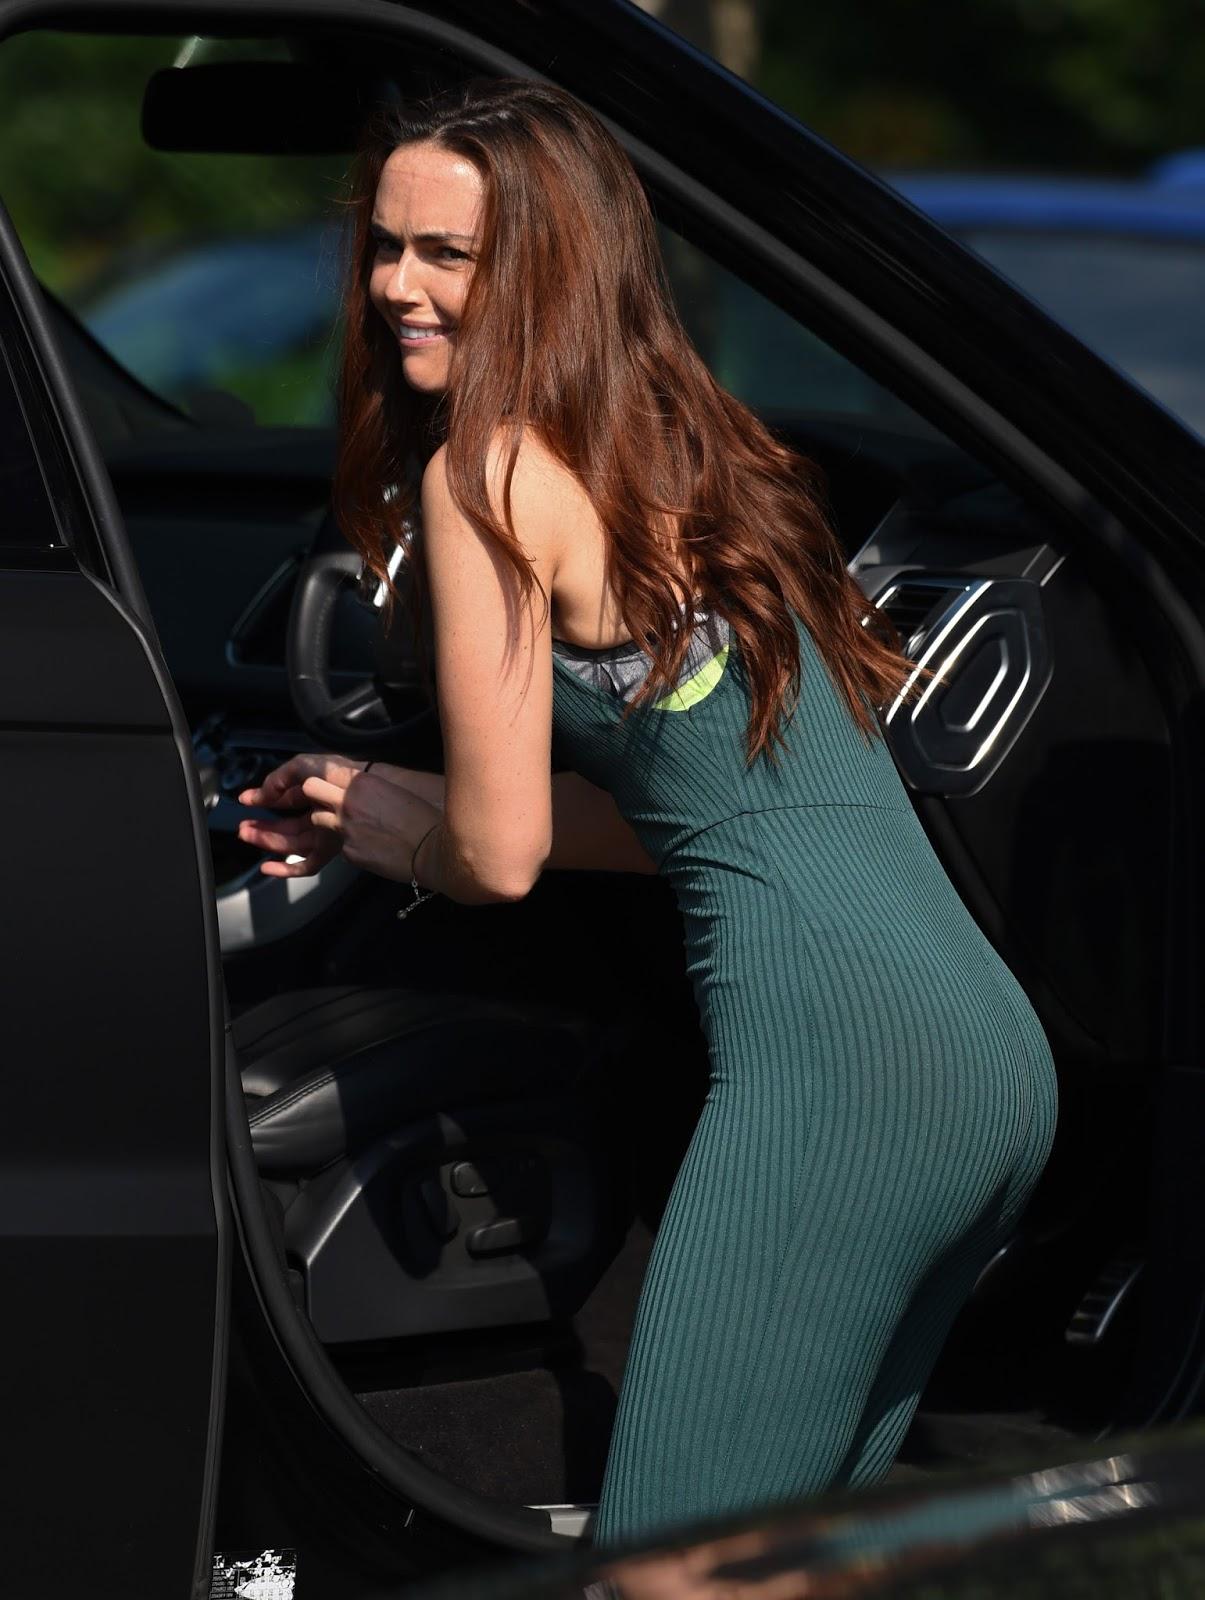 Jennifer Metcalfe Wearing a tight sheer bodysuit